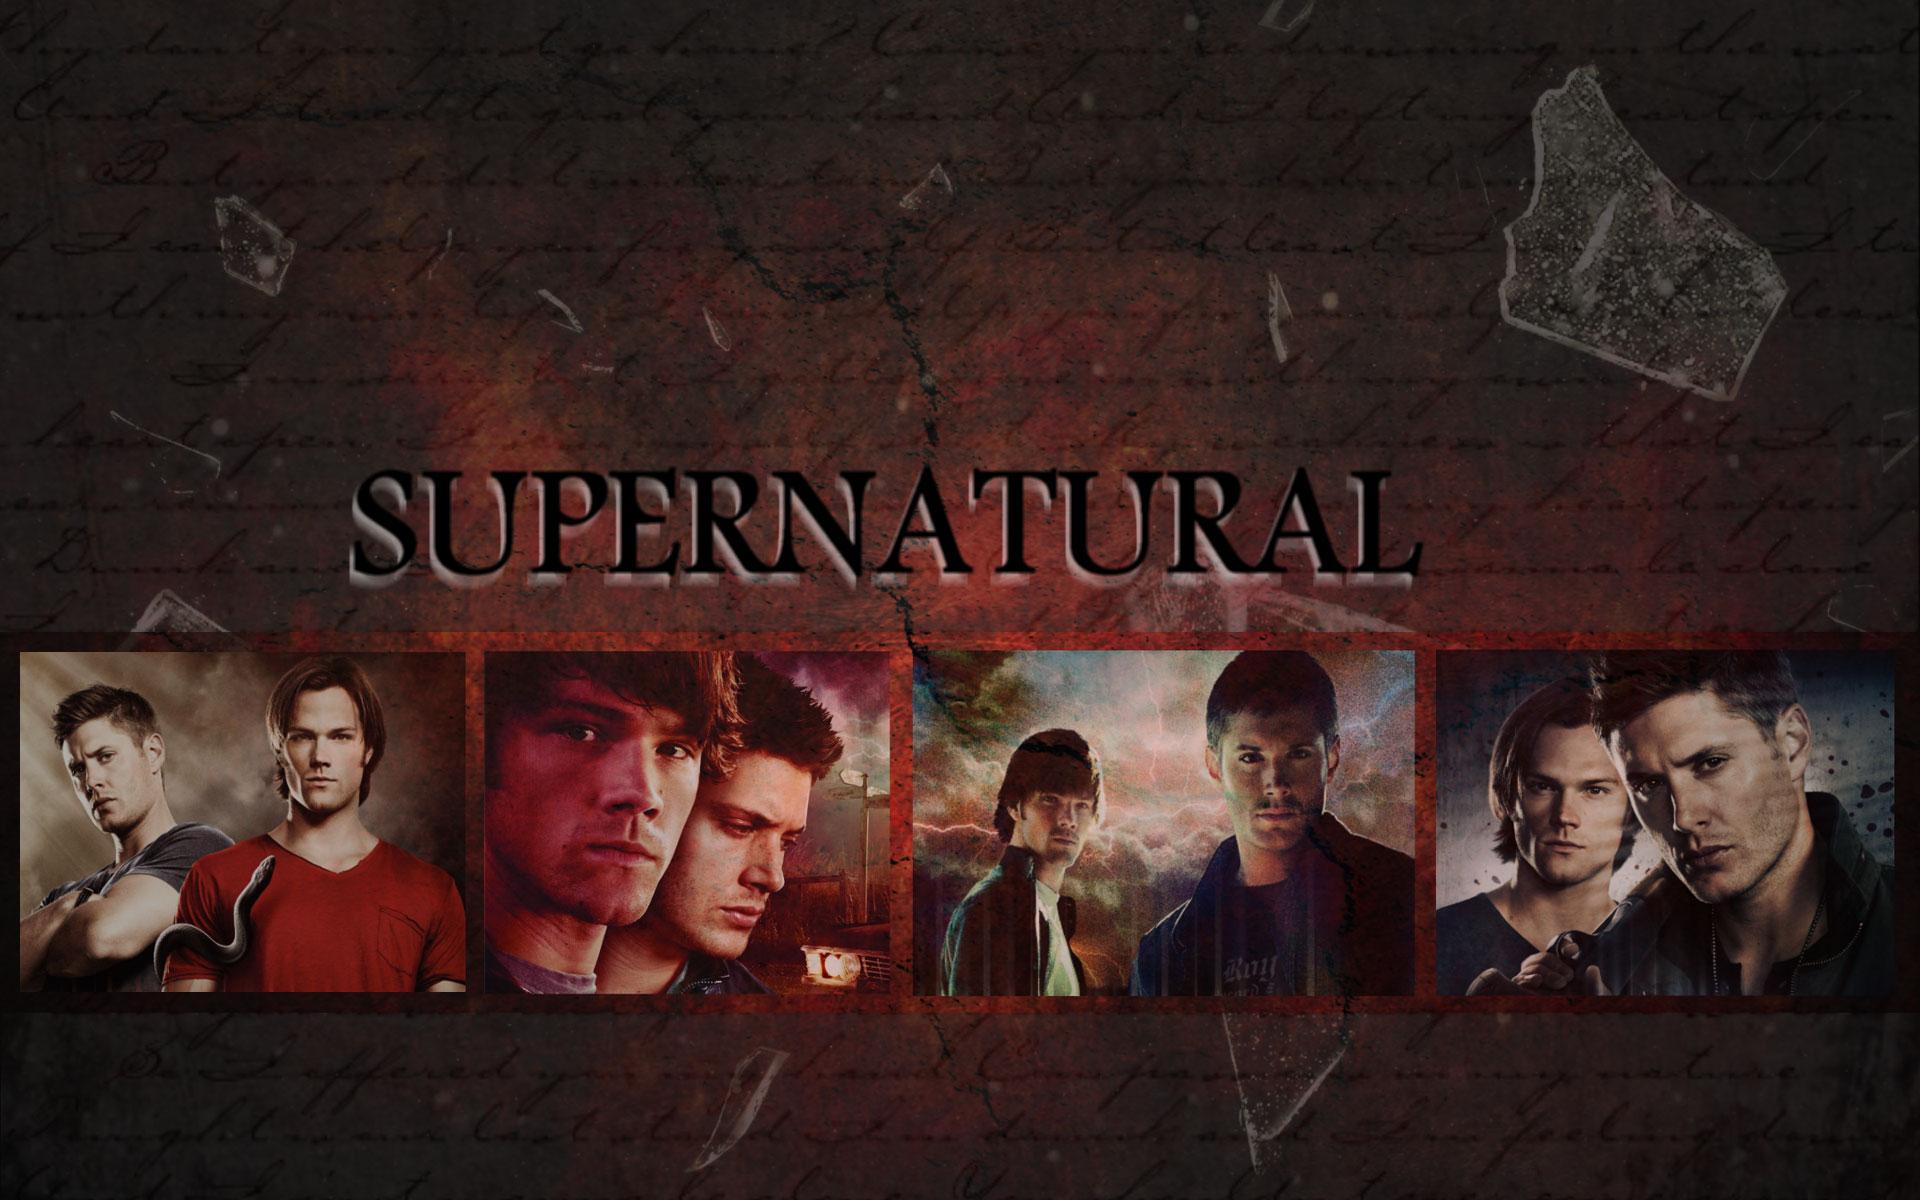 supernatural wallpaper hd